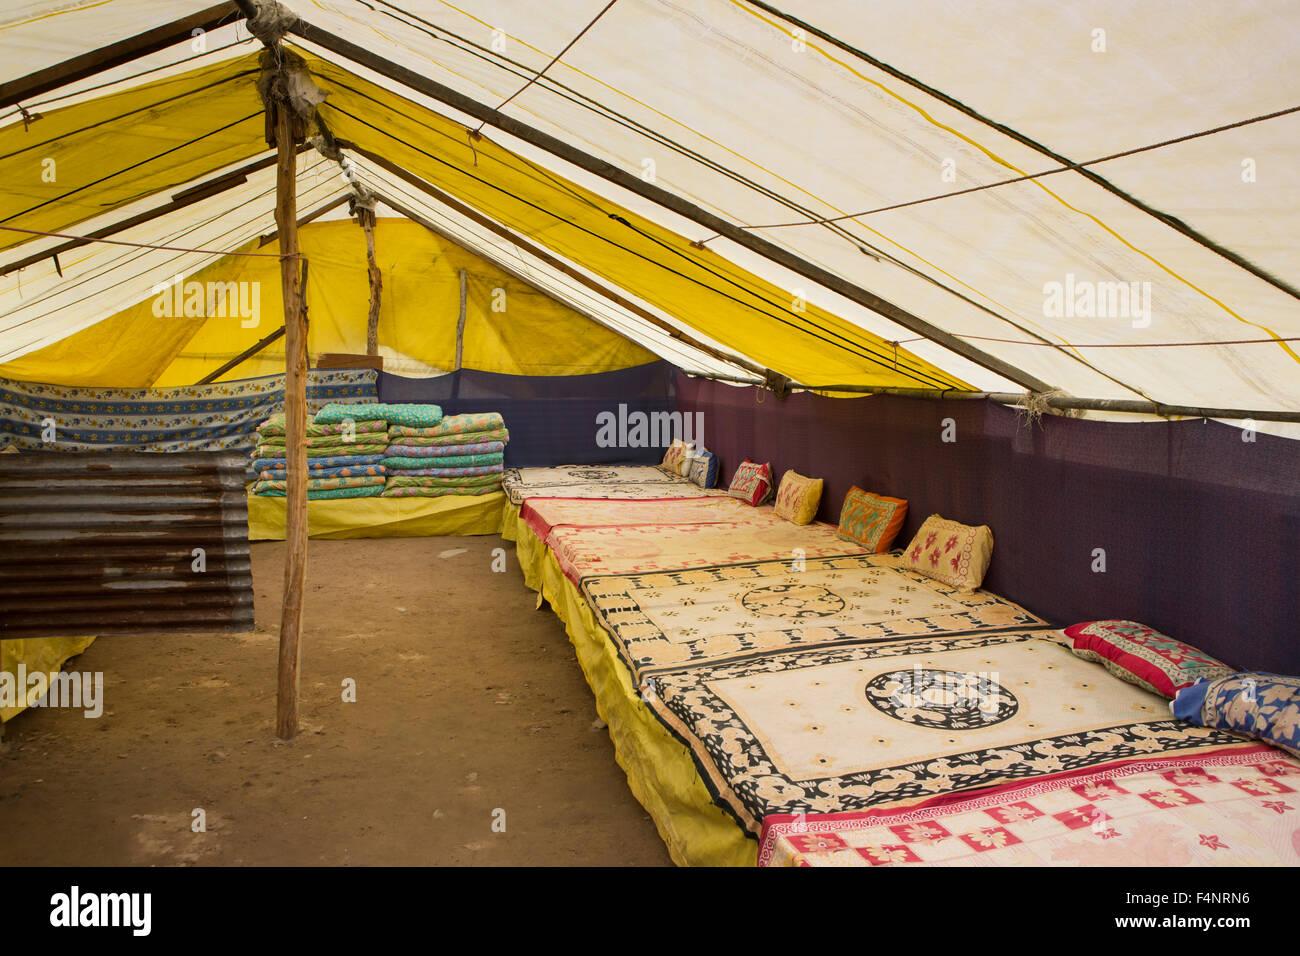 India, Himachal Pradesh, Lahaul and Spiti, Patsio, tent accommodation interior, matresses - Stock Image